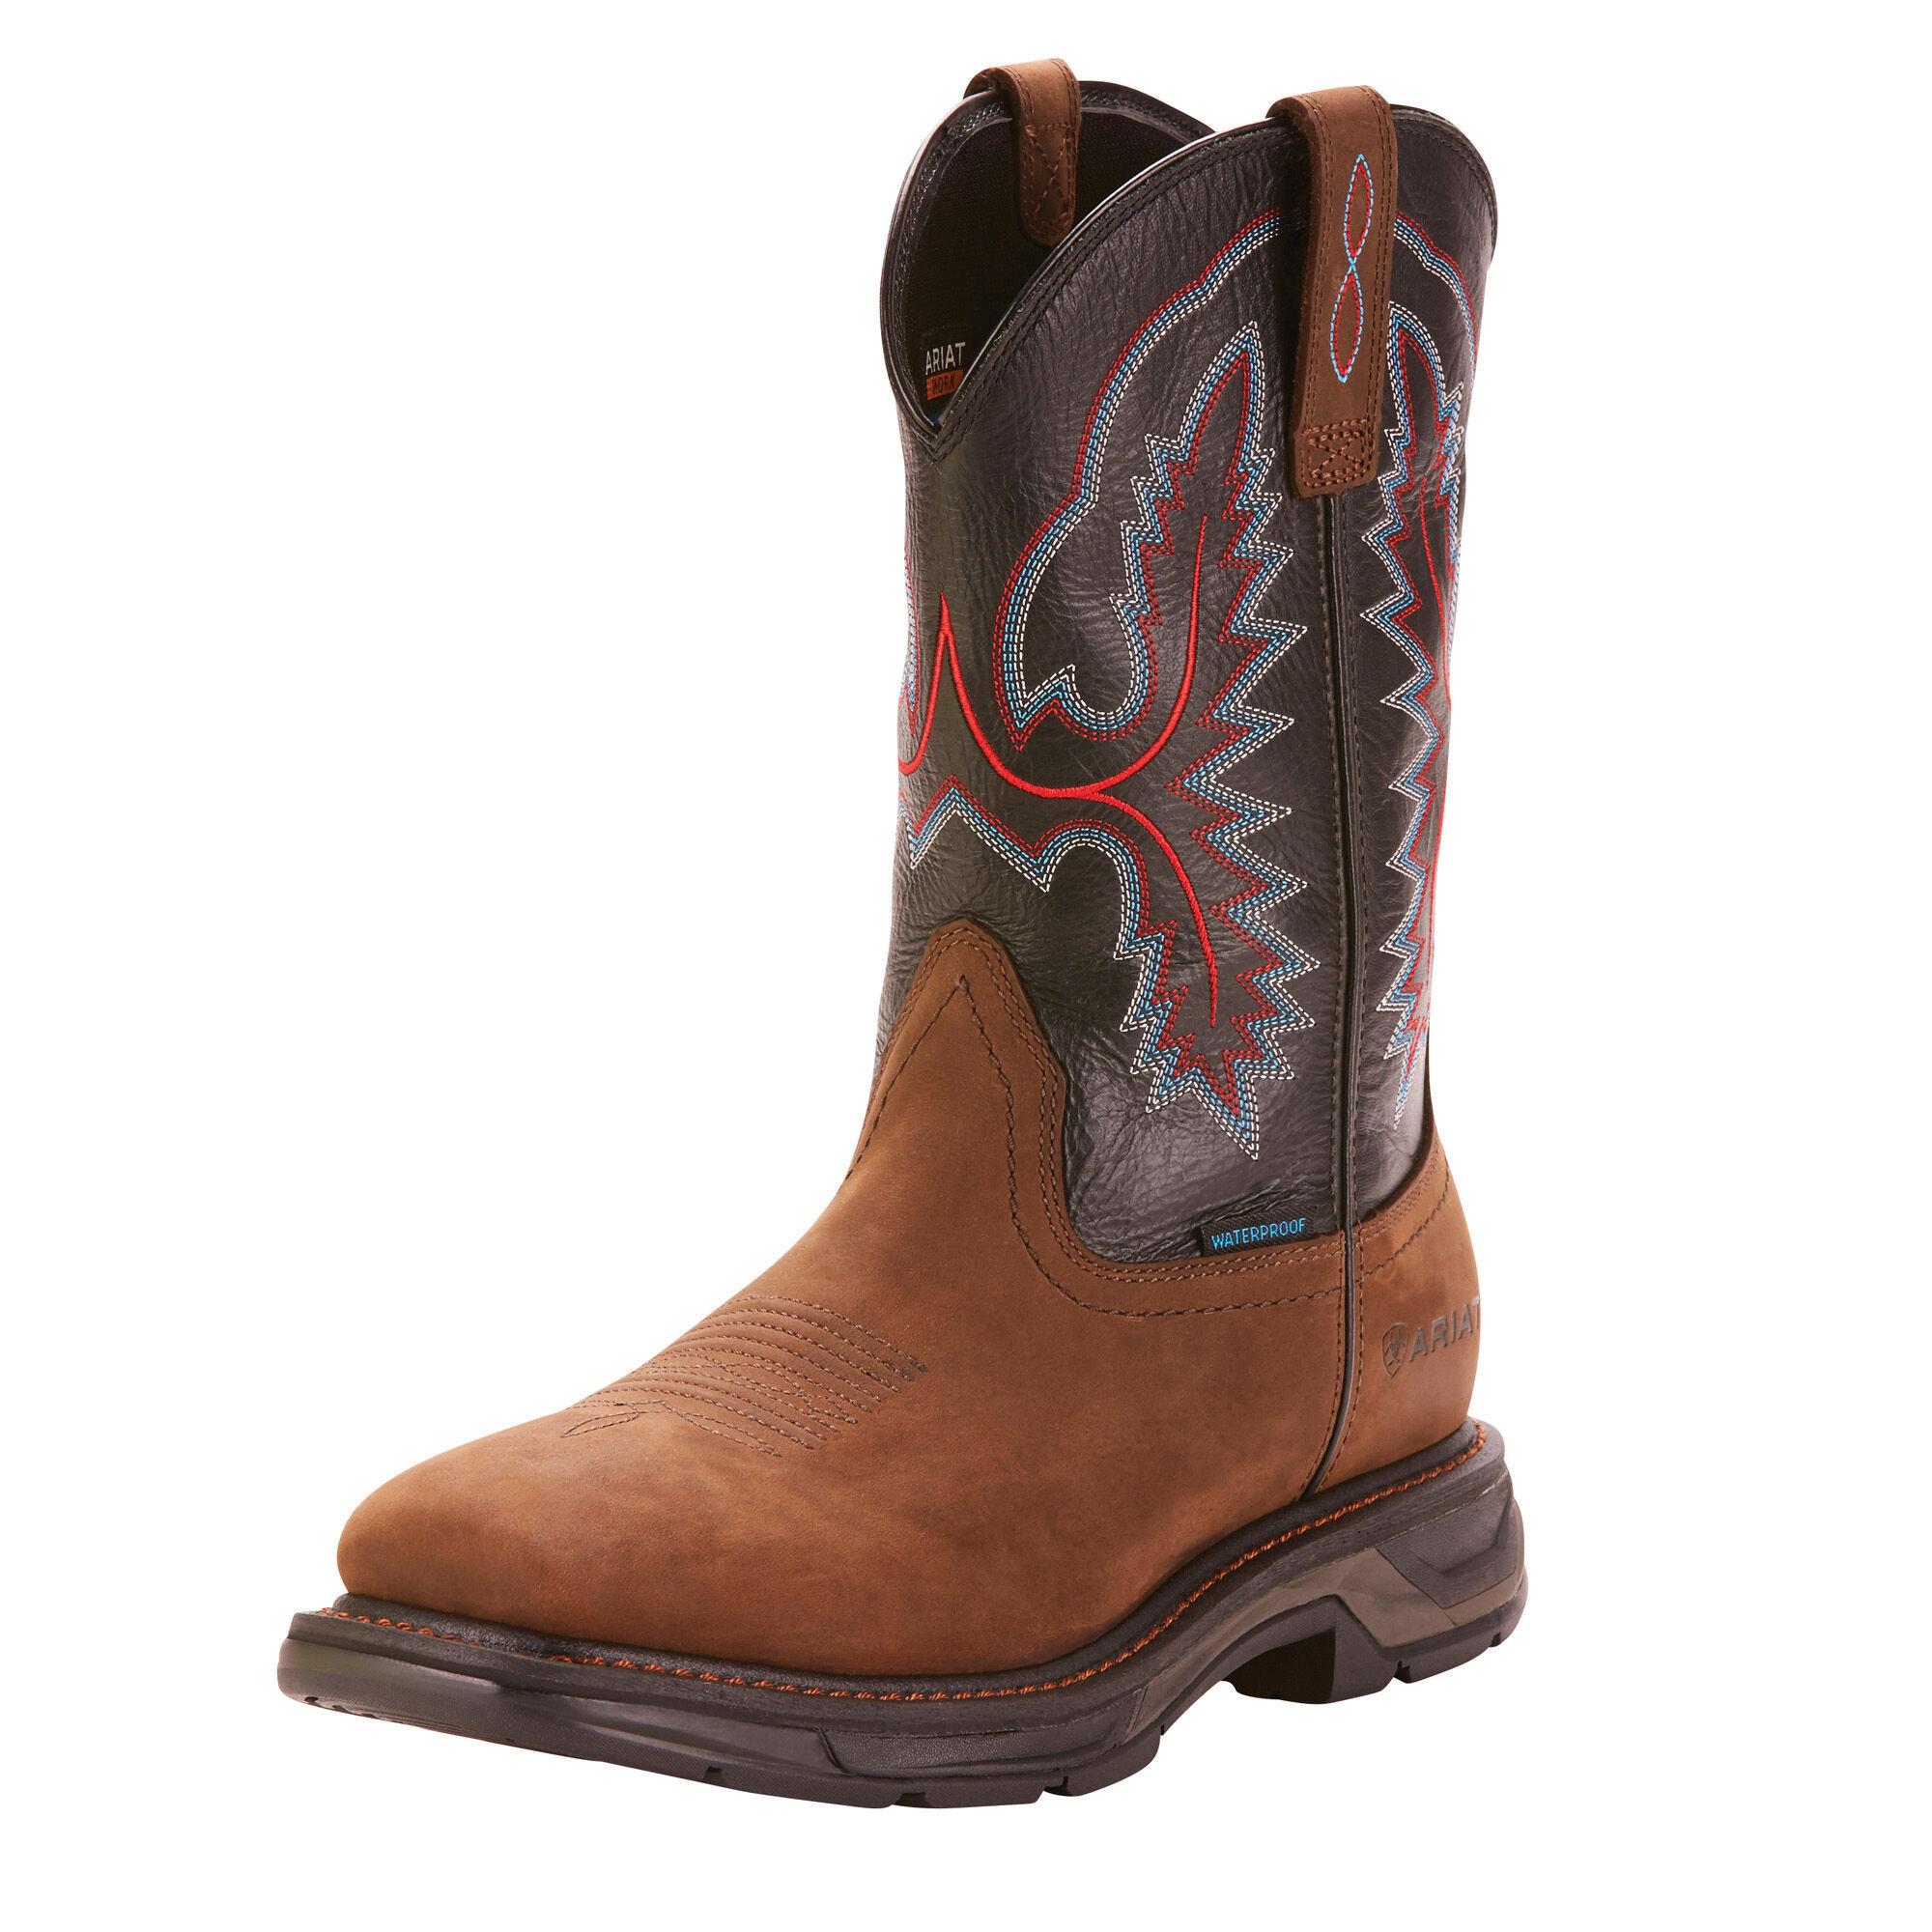 WorkHog XT Waterproof Work Boot